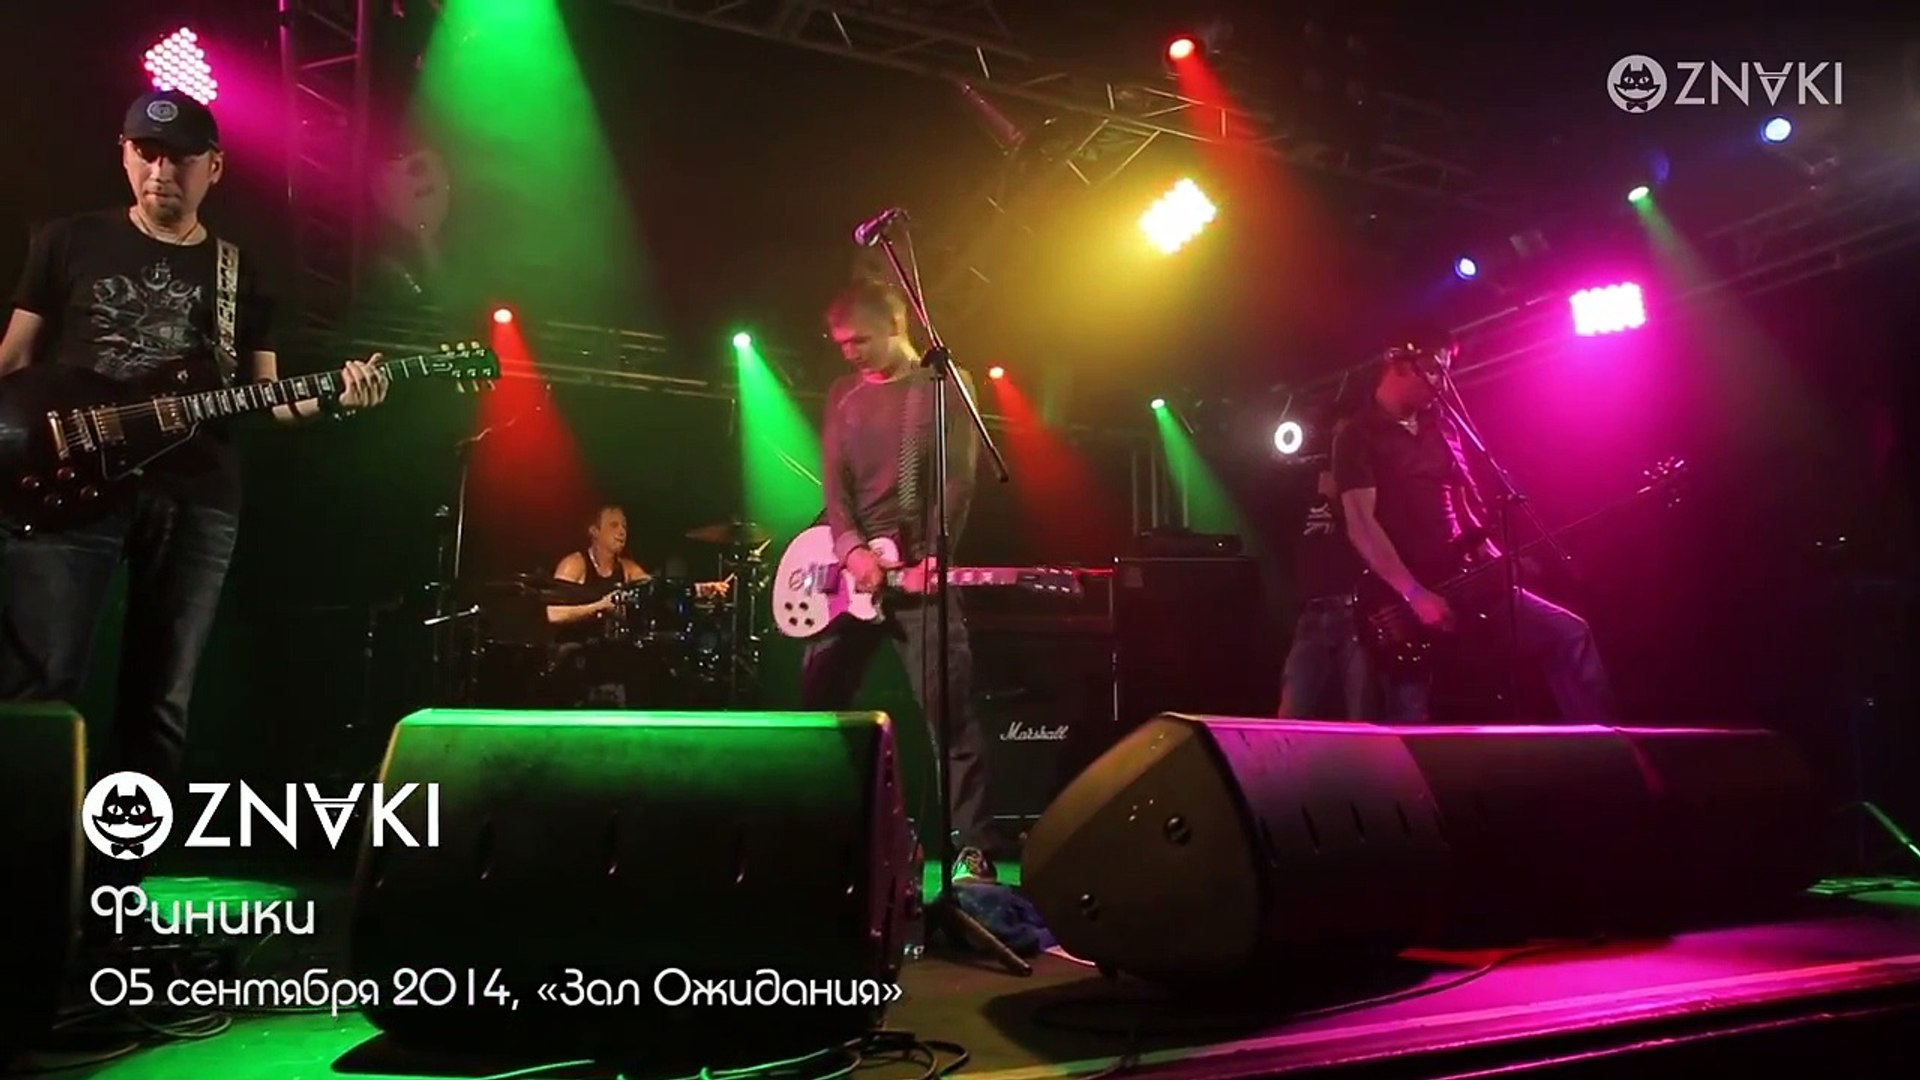 ZNAKI – 19 – Финики – Live – Концерт в клубе «Зал Ожидания» – 5.09.2014